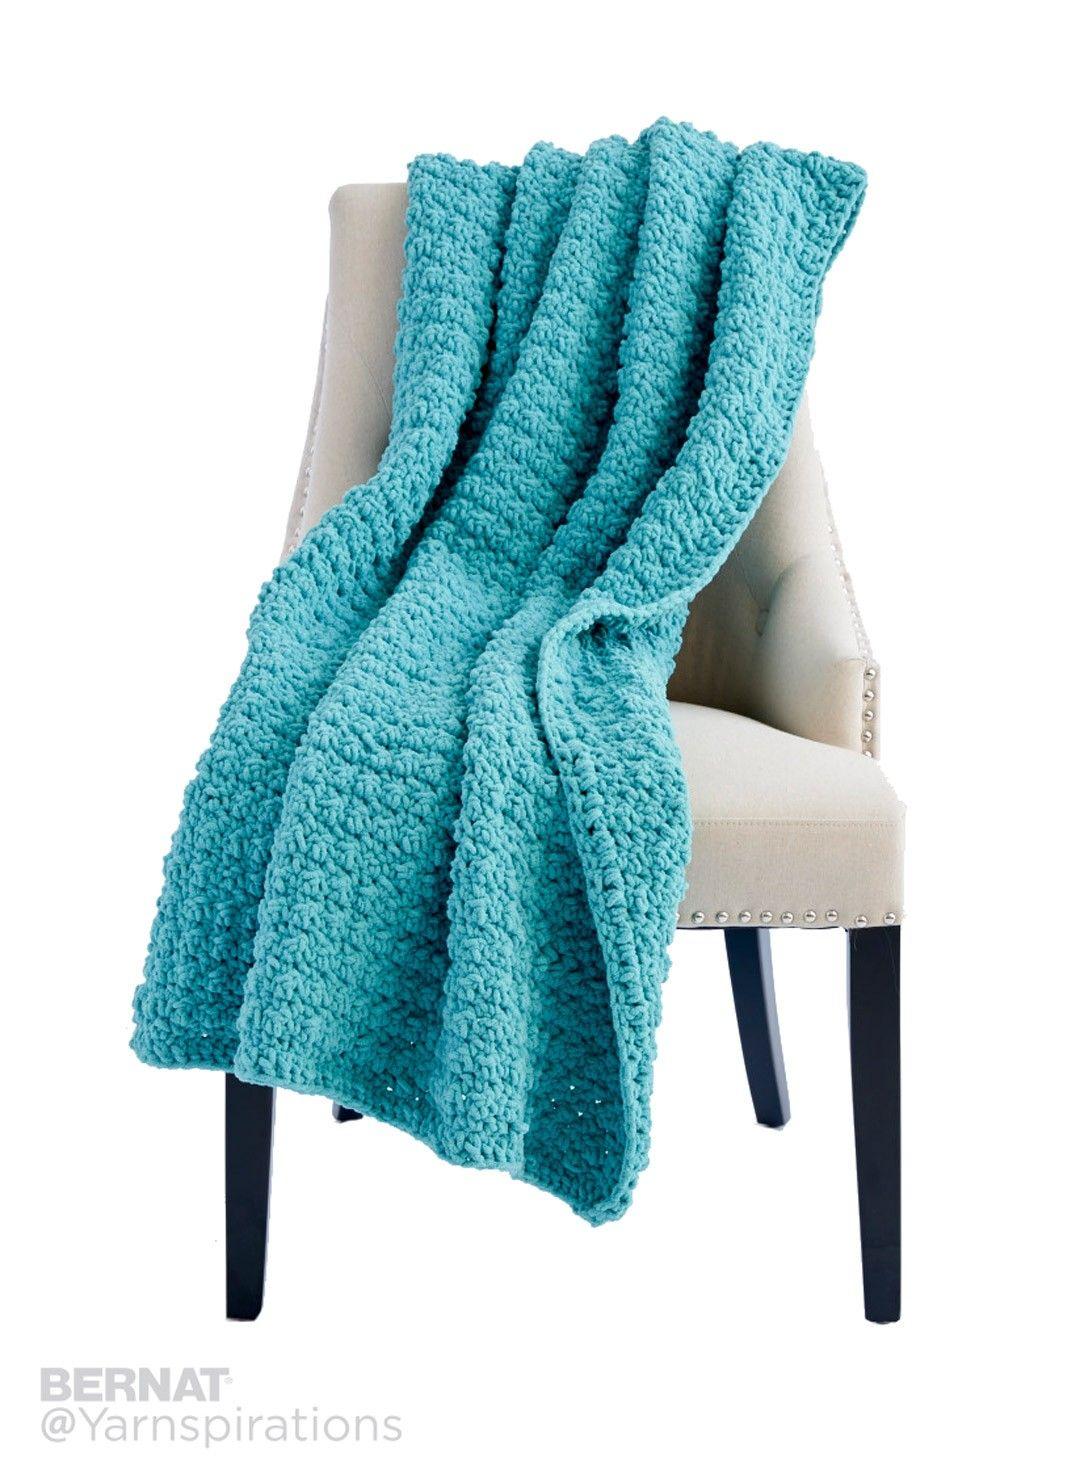 Tiny Bubbles Crochet Blanket   Crochet Baby/Kids   Pinterest   Tejido